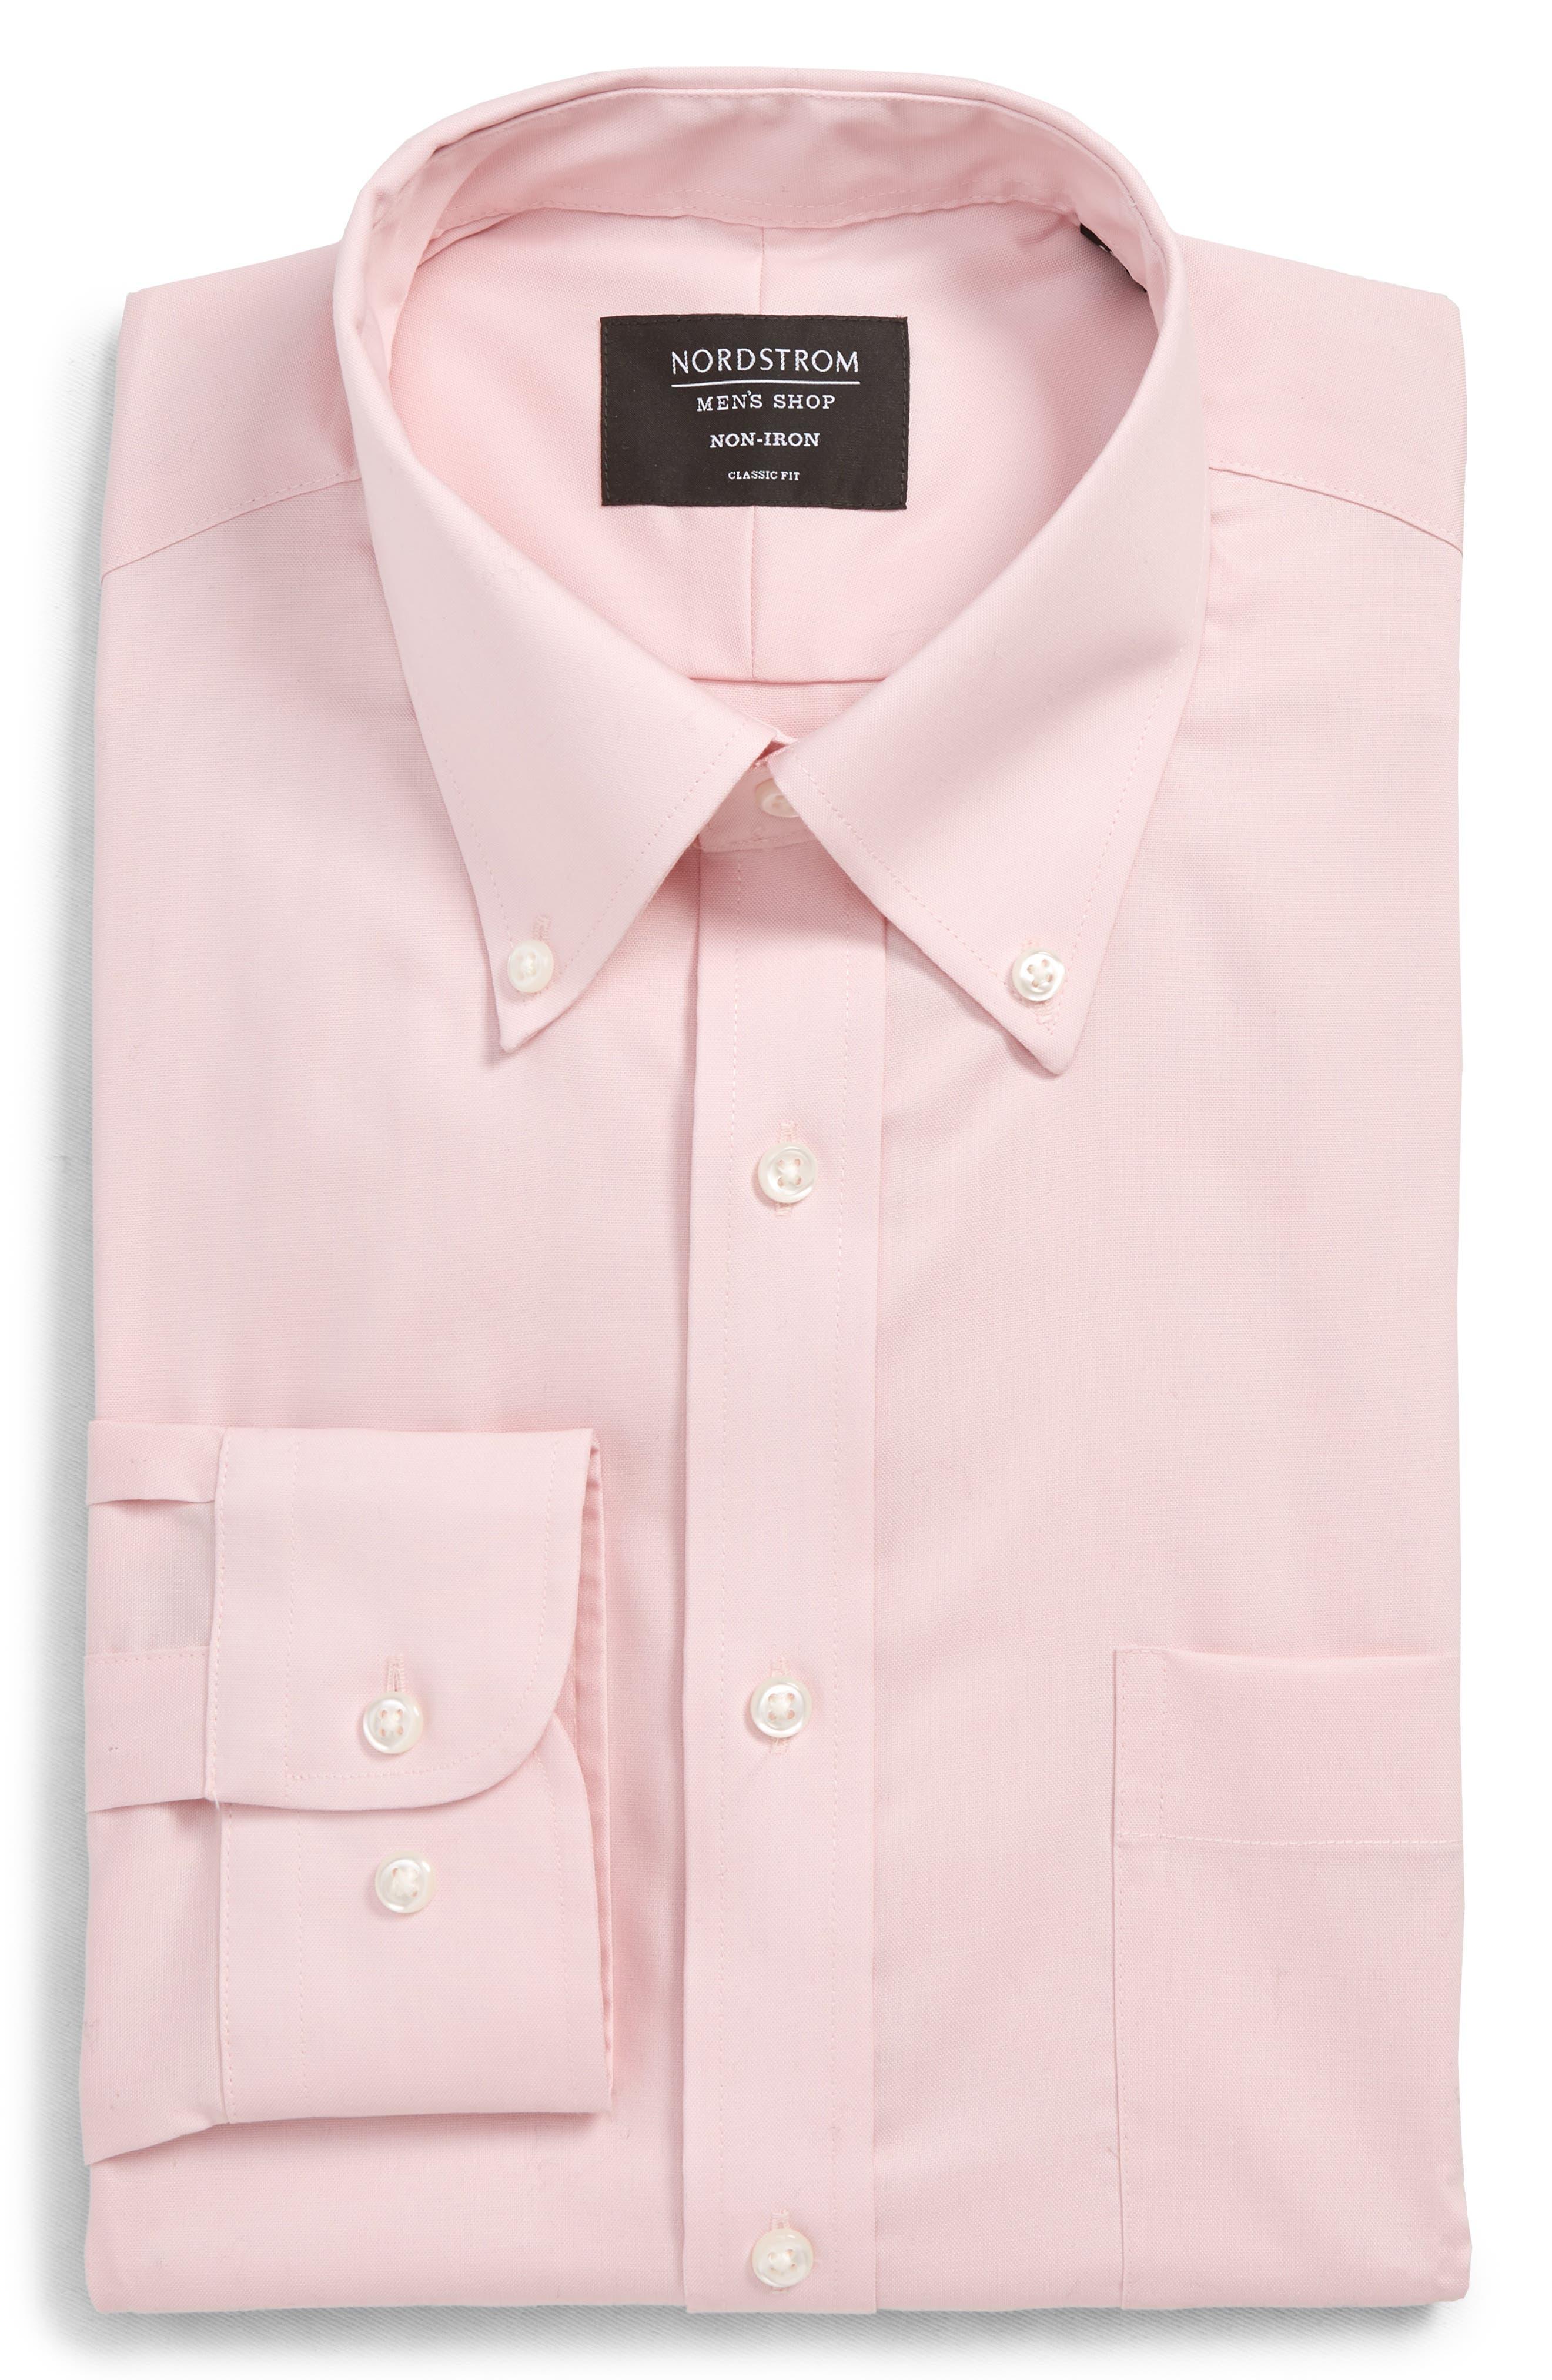 NORDSTROM MEN'S SHOP, Classic Fit Non-Iron Dress Shirt, Main thumbnail 1, color, PINK BREATH